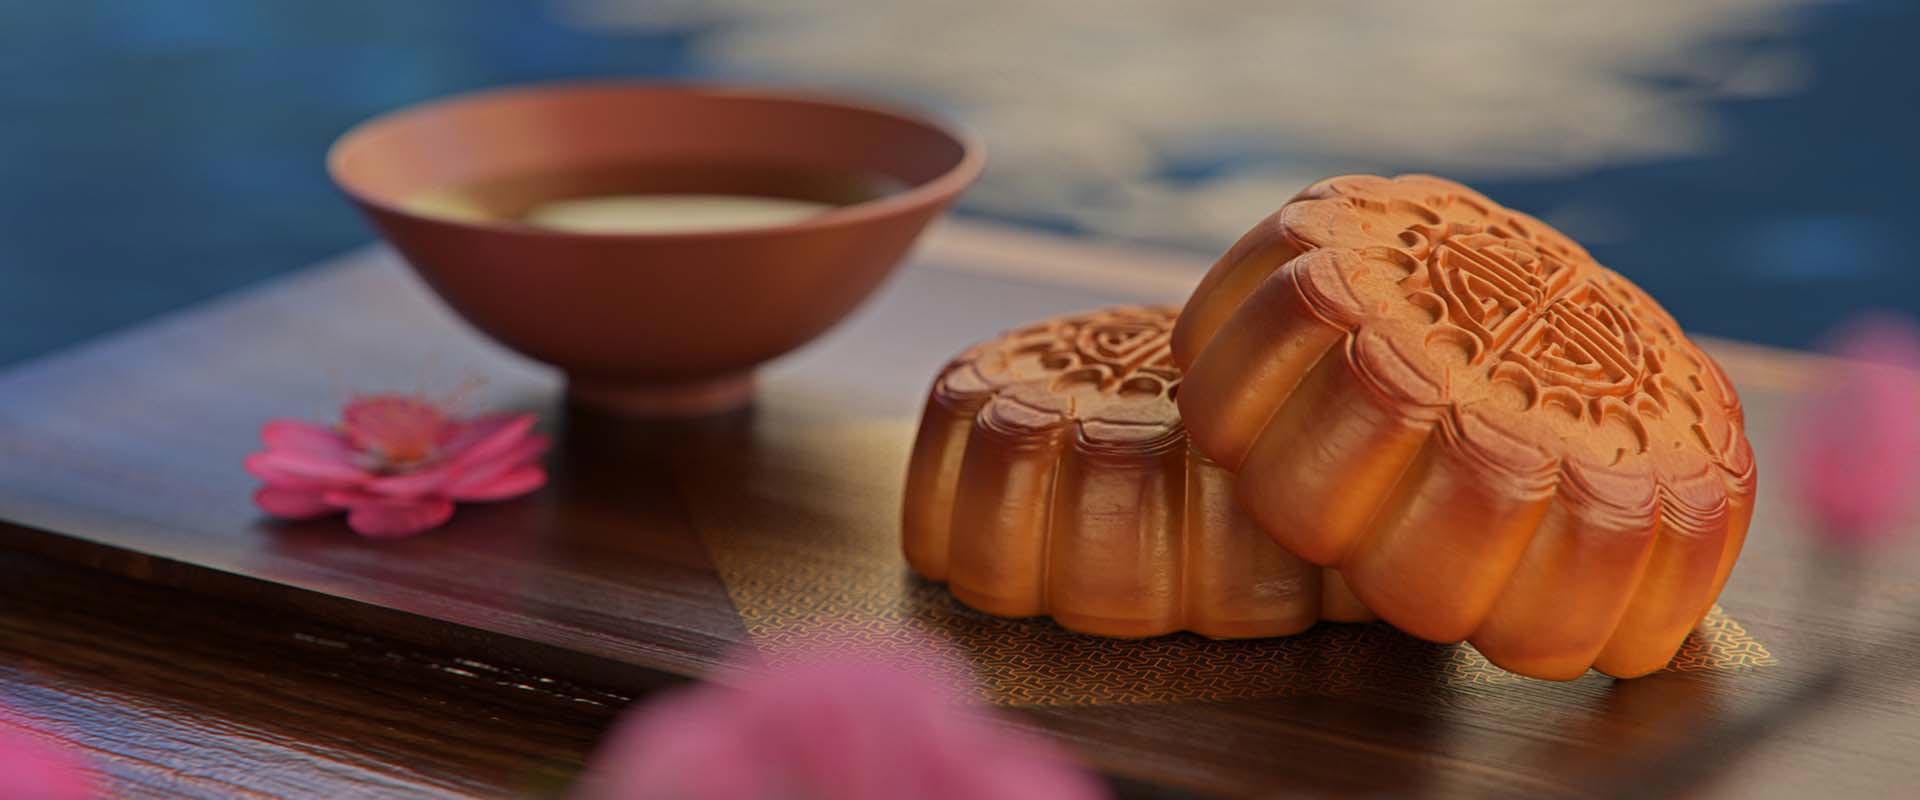 Mid-Autumn Festival 2020, 2021 And 2022 - Publicholidays.sg-Food Holidays 2021